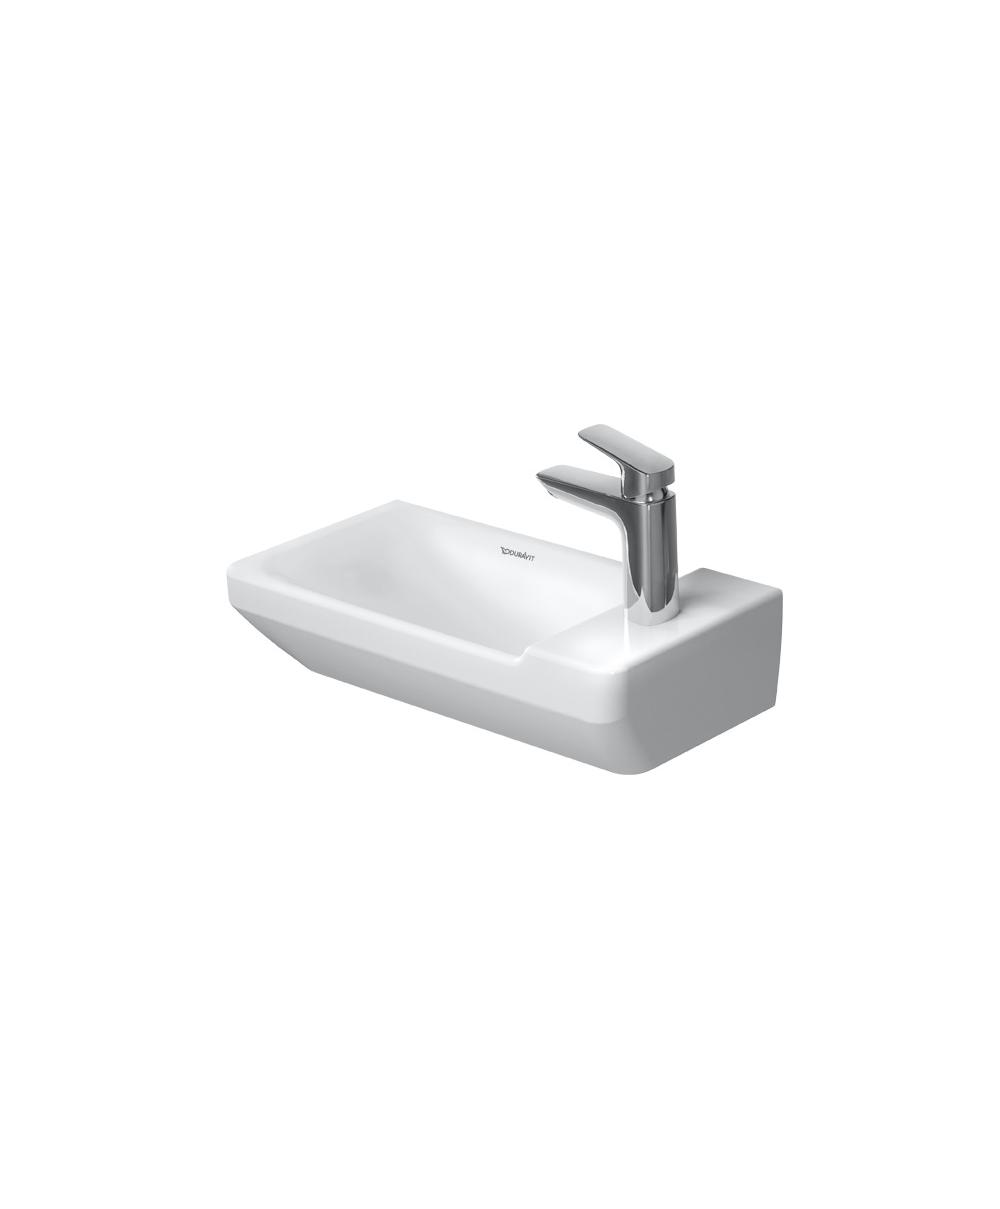 P3 Comforts Cloakroom Washbasin